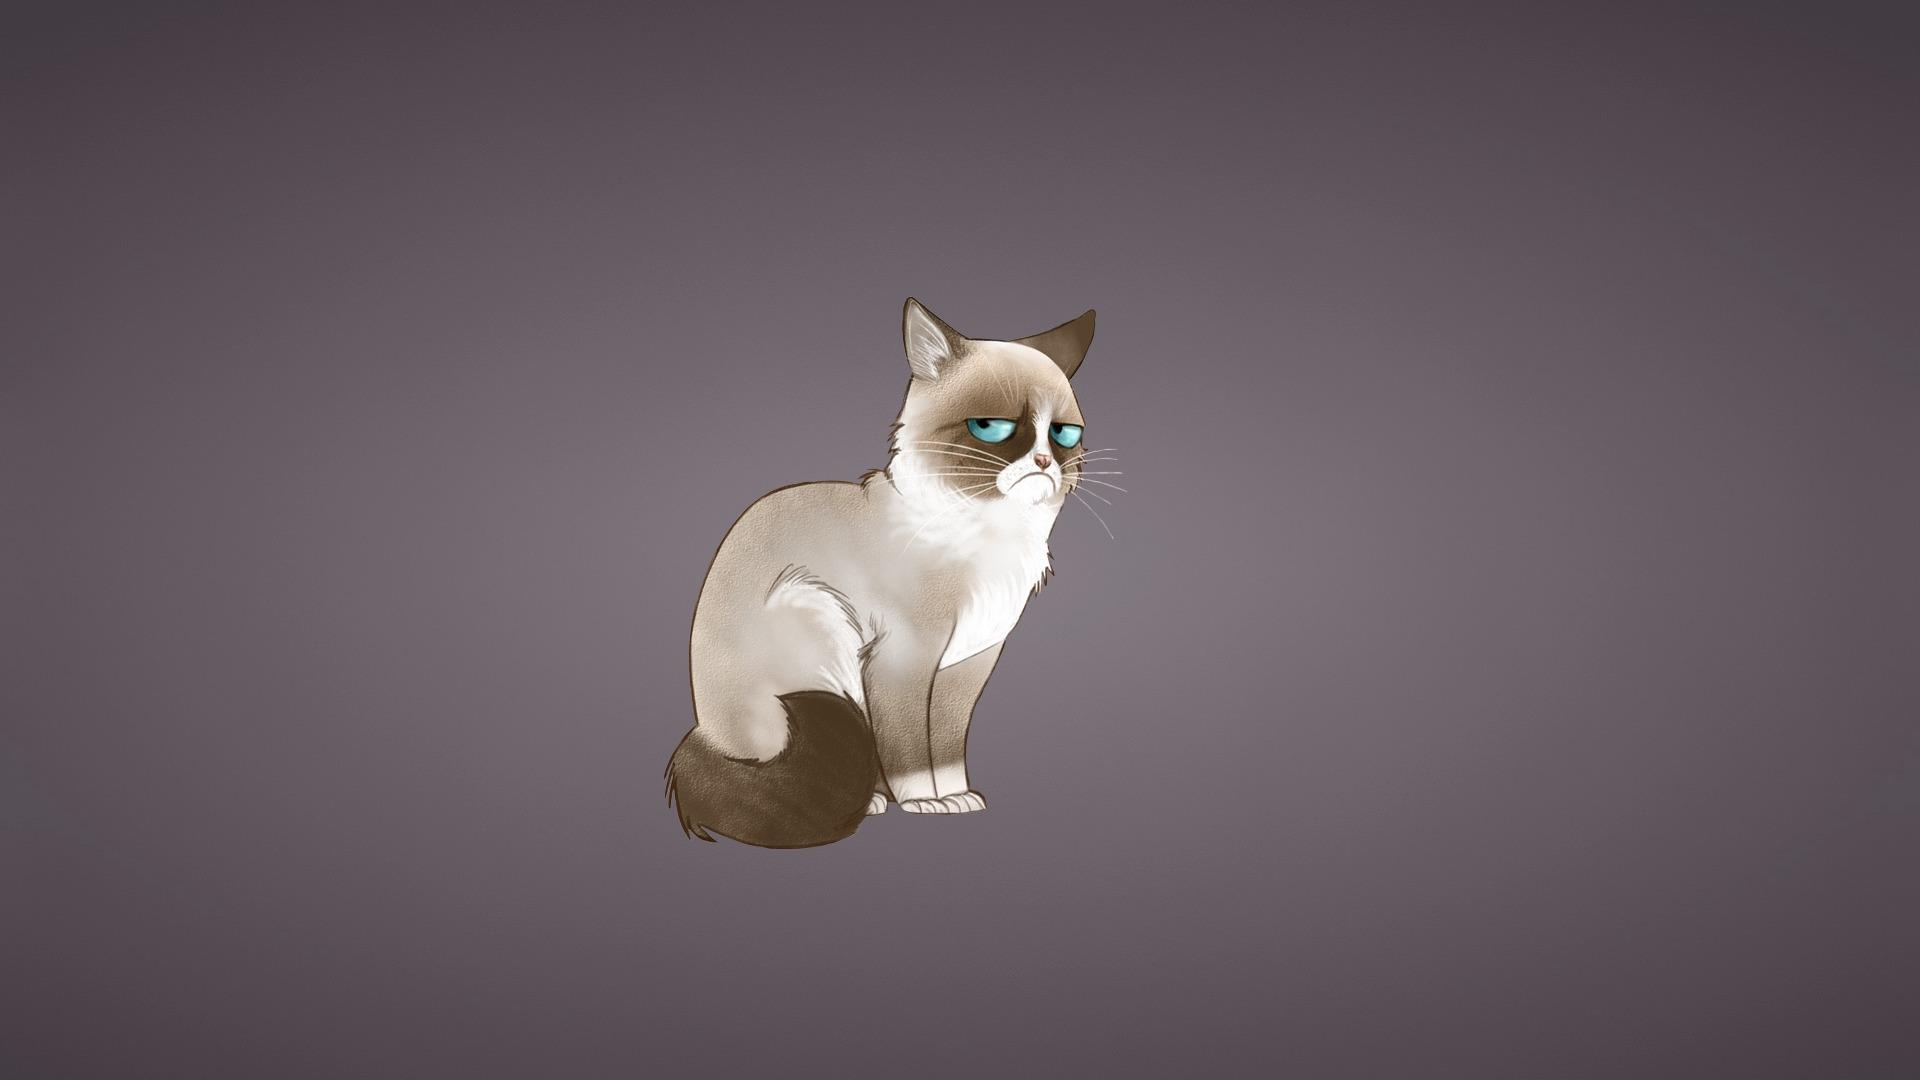 sad cat meme wallpaper 72684